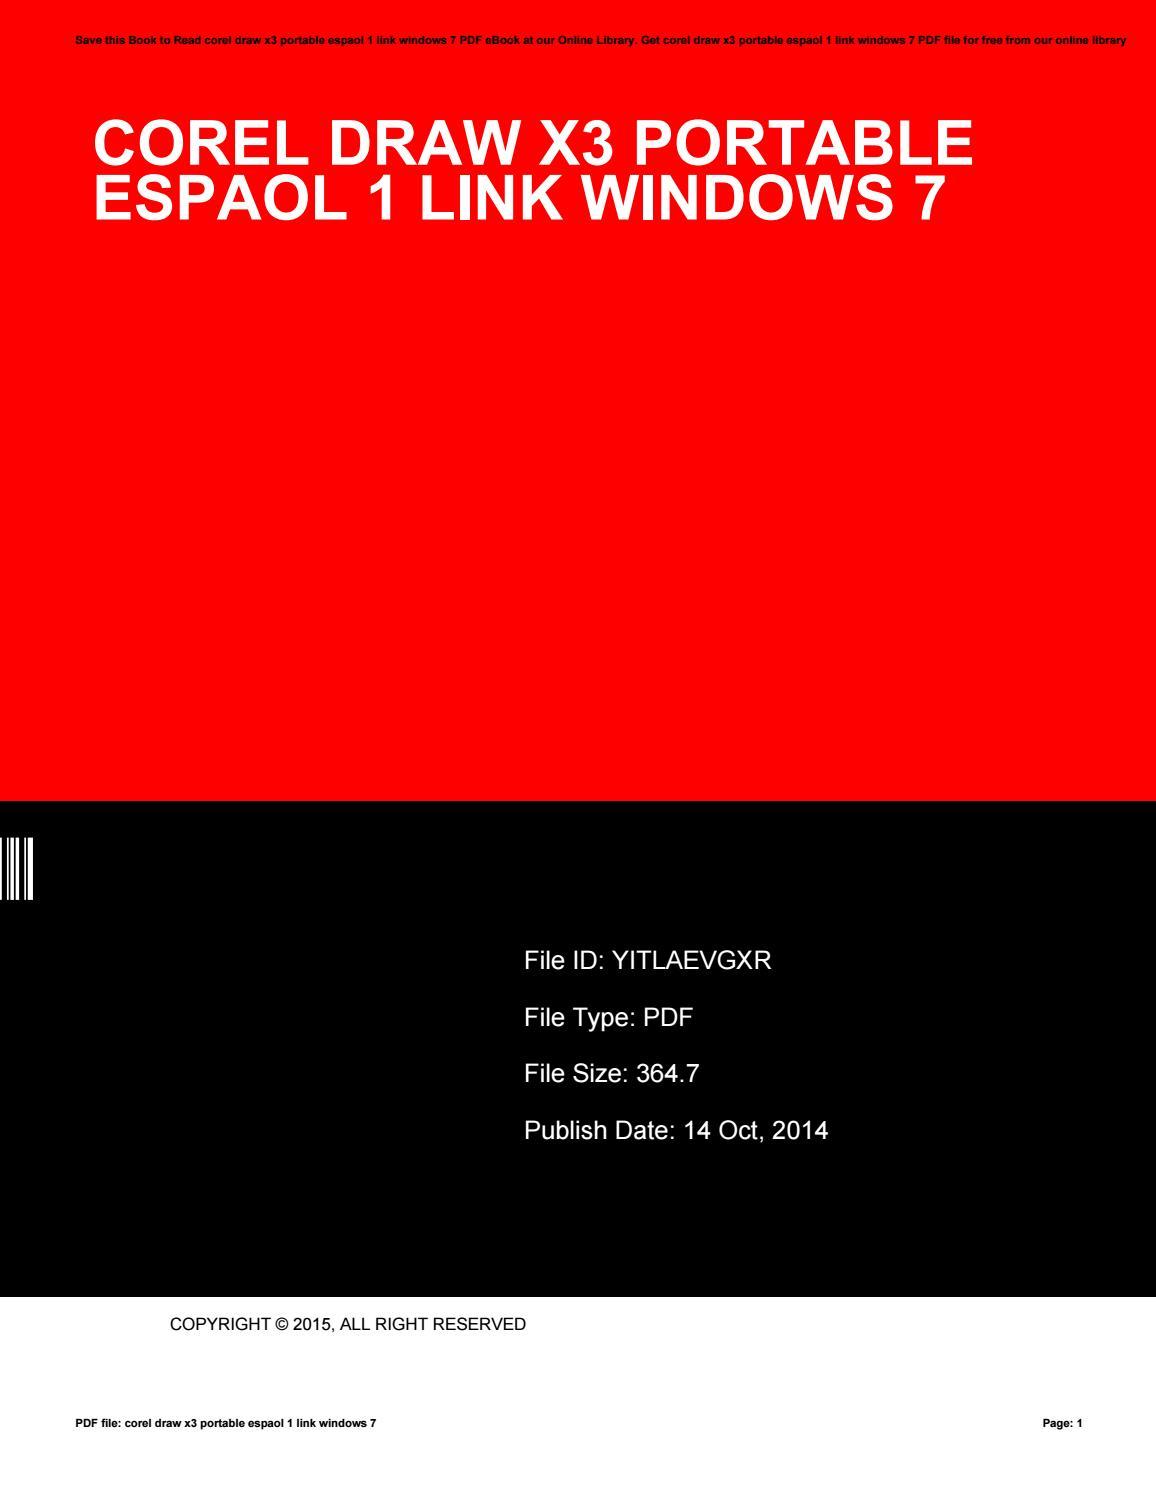 CorelDraw x3 Full Poratble Free Download for Windows Tanpa Install